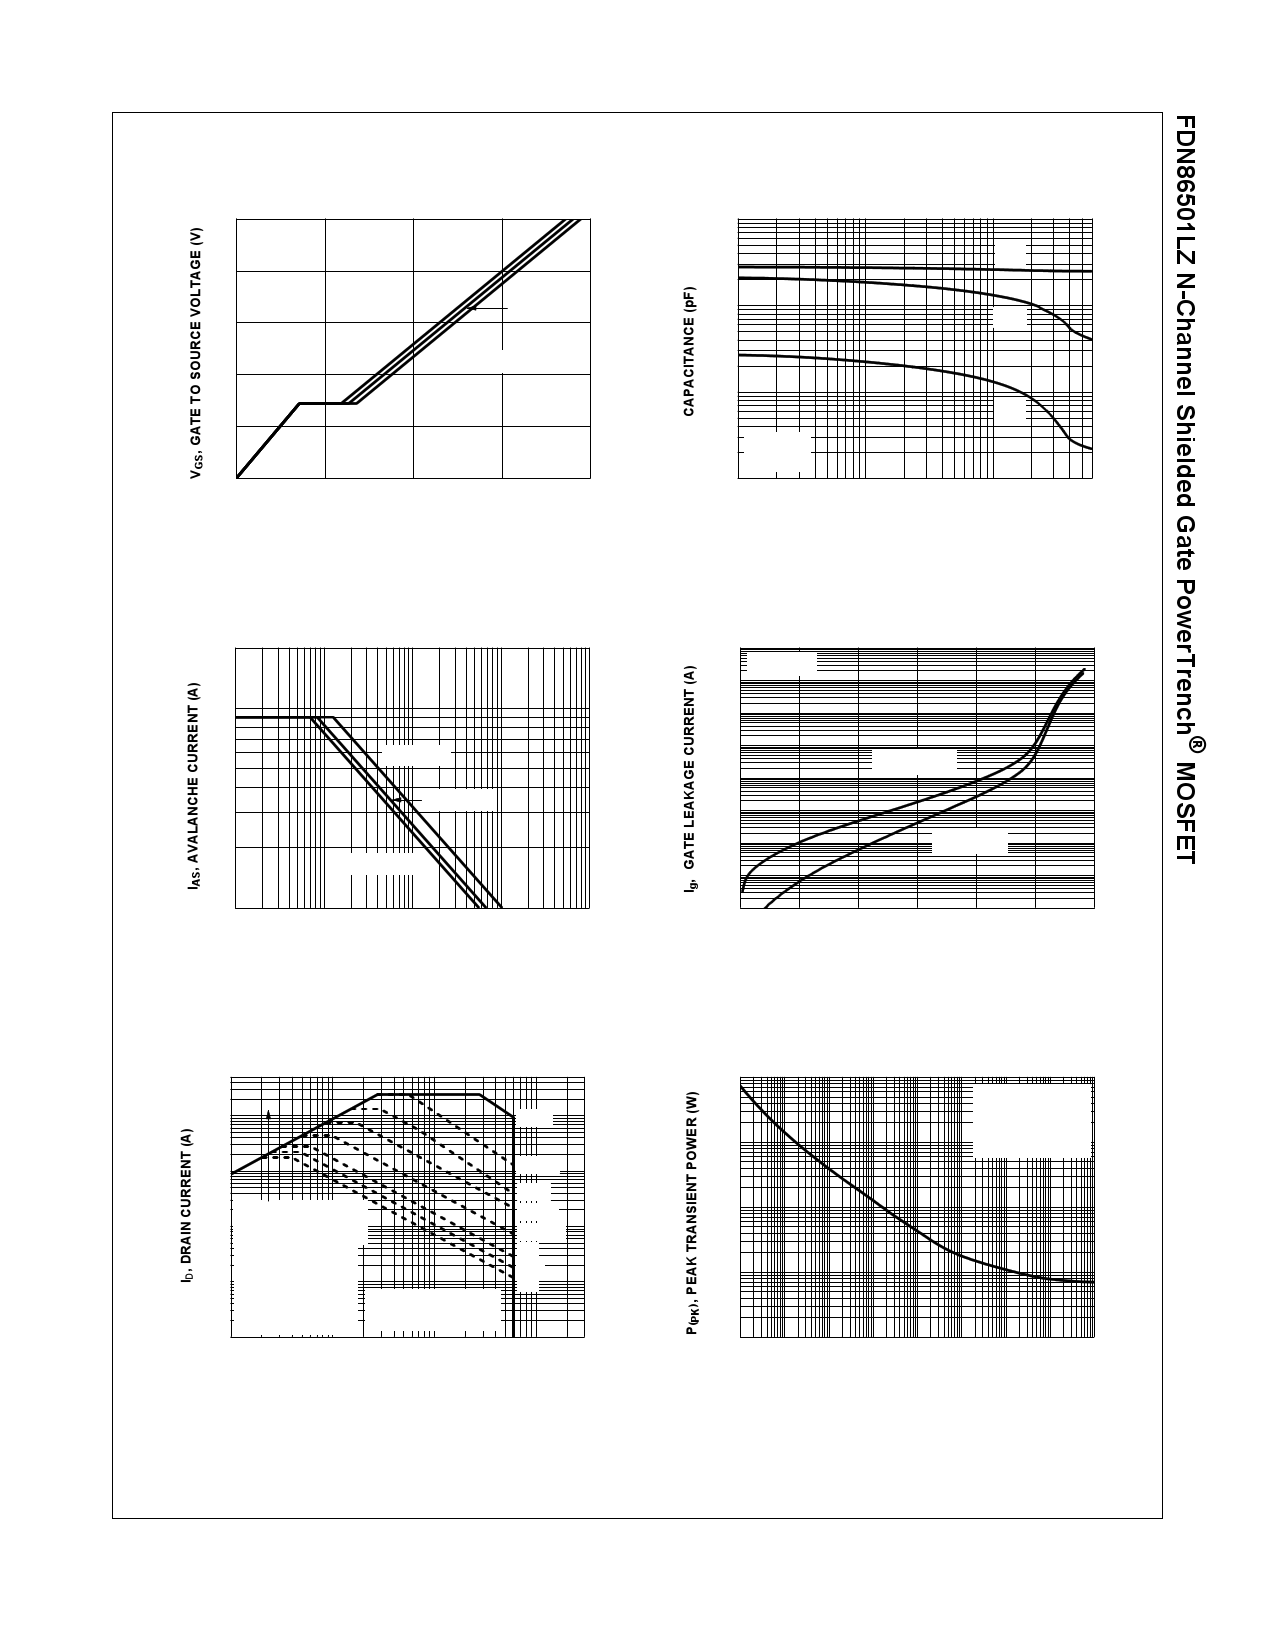 FDN86501LZ pdf, 반도체, 판매, 대치품